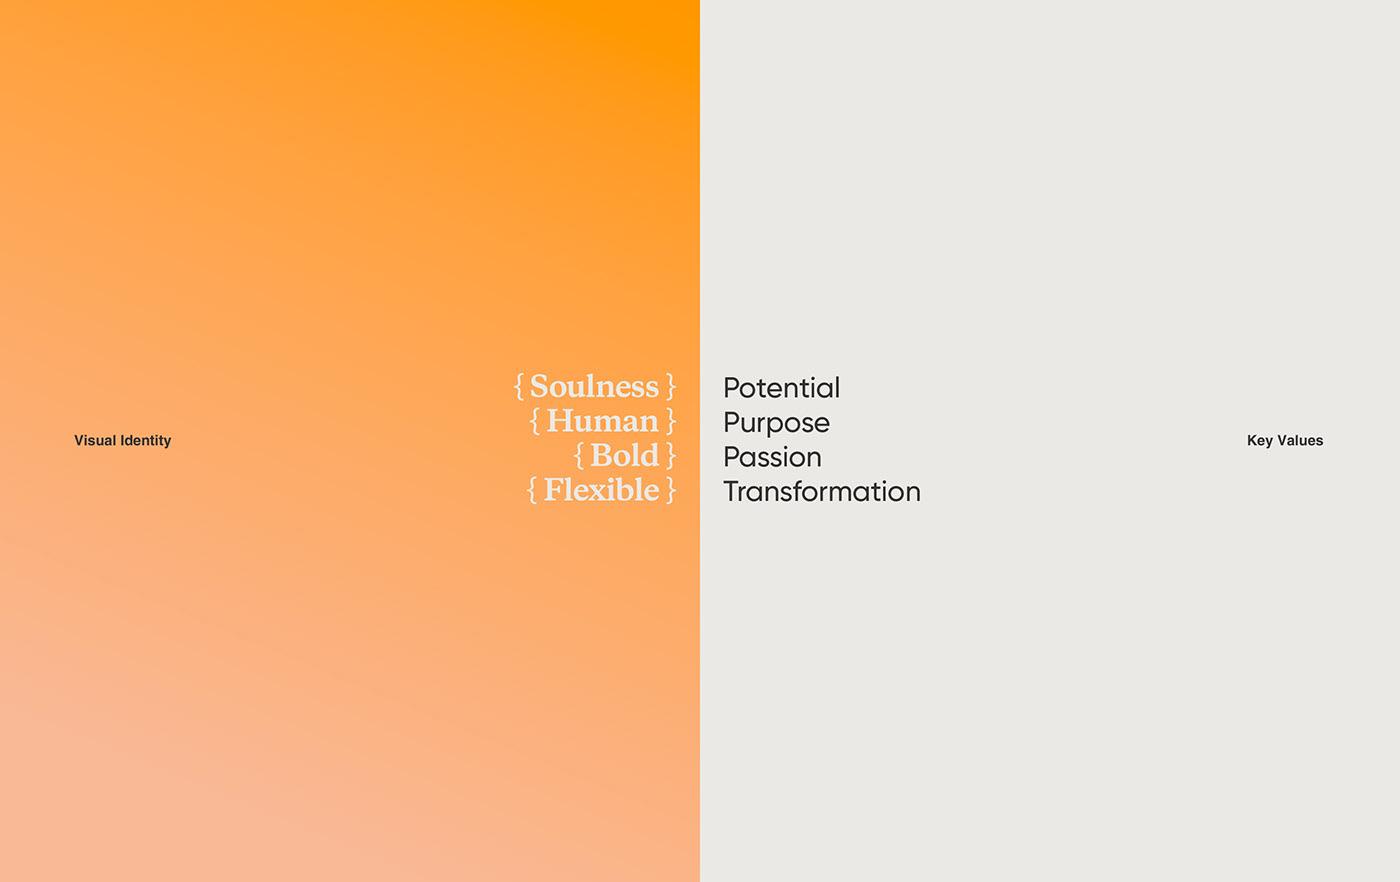 actual agenda color identity millenial modern orange potential visual identity Young